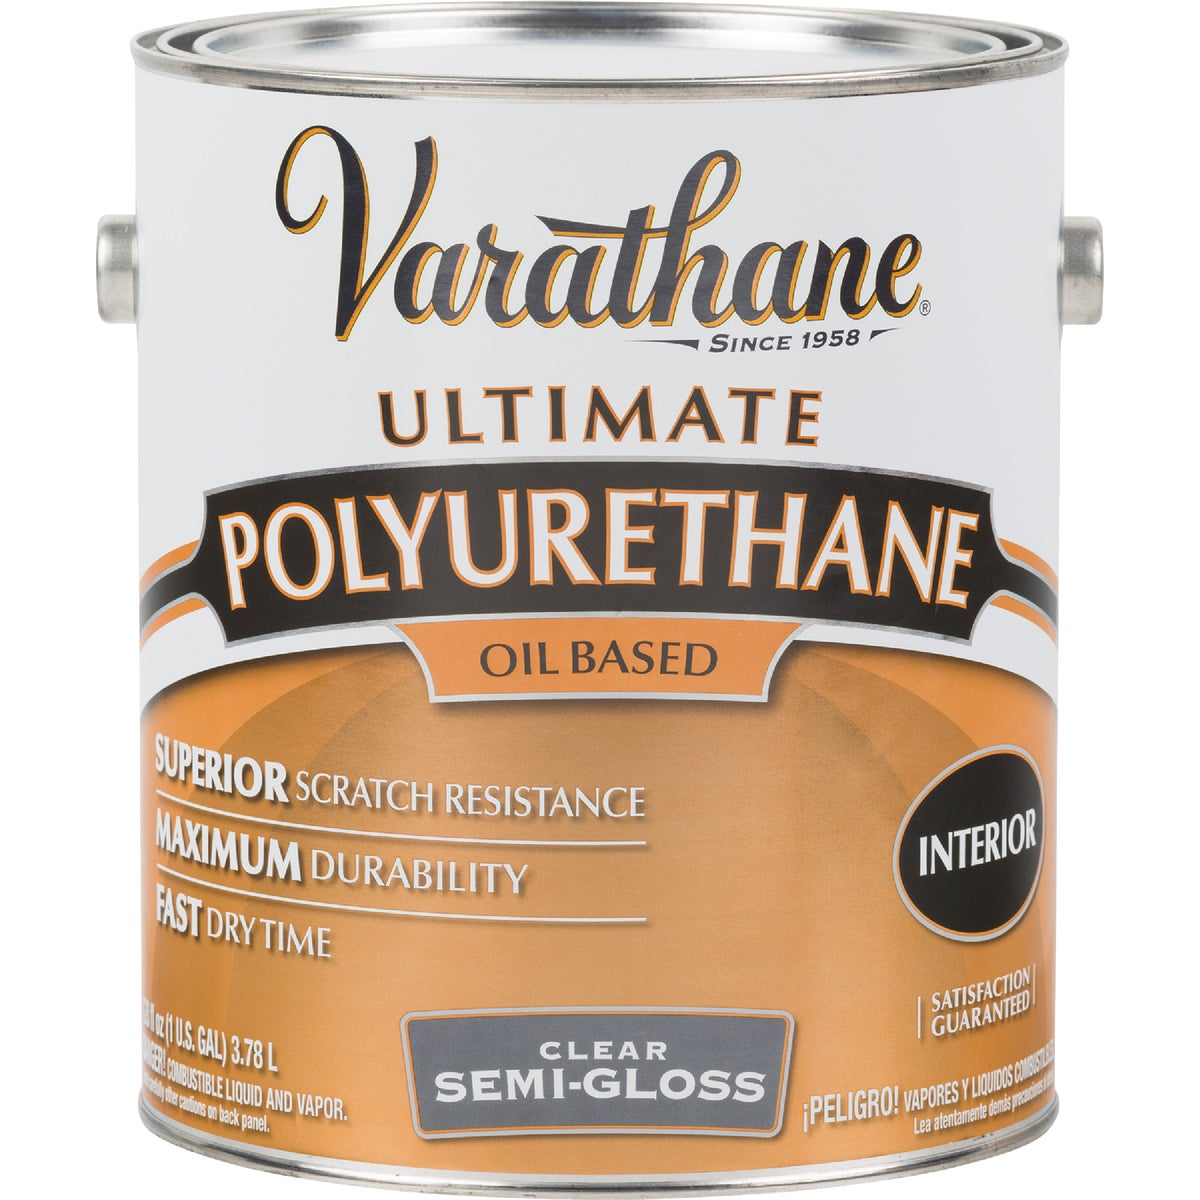 INT S/G POLYURETHANE - 6031 by Rustoleum